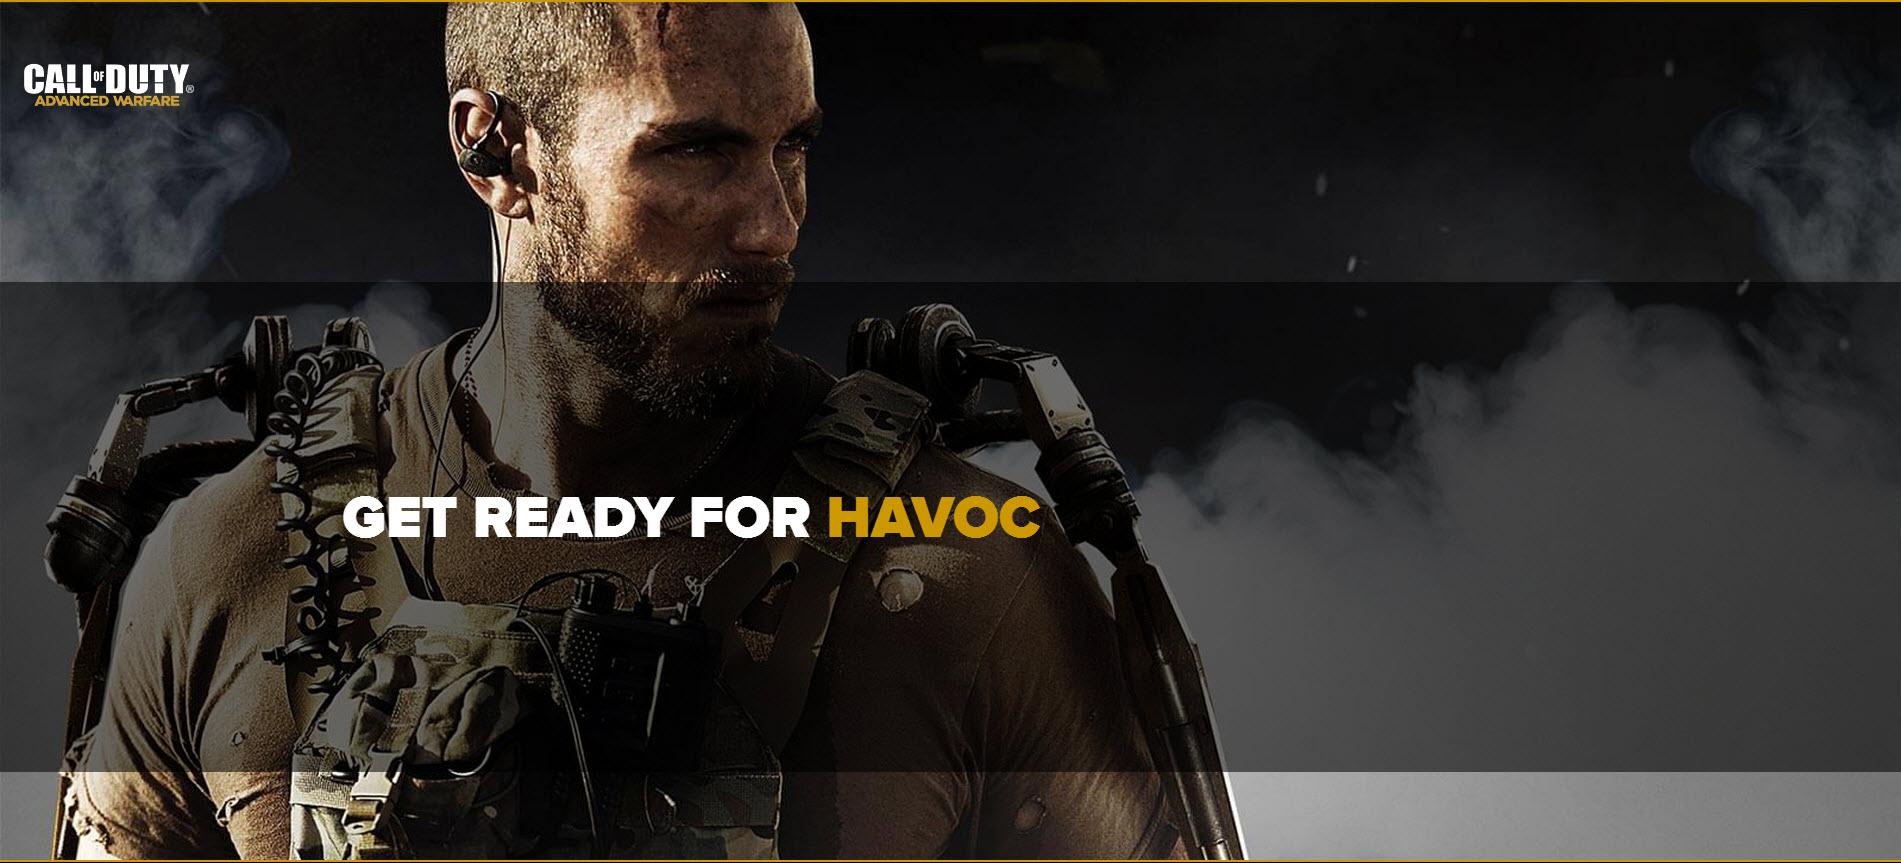 COD:AW Havoc